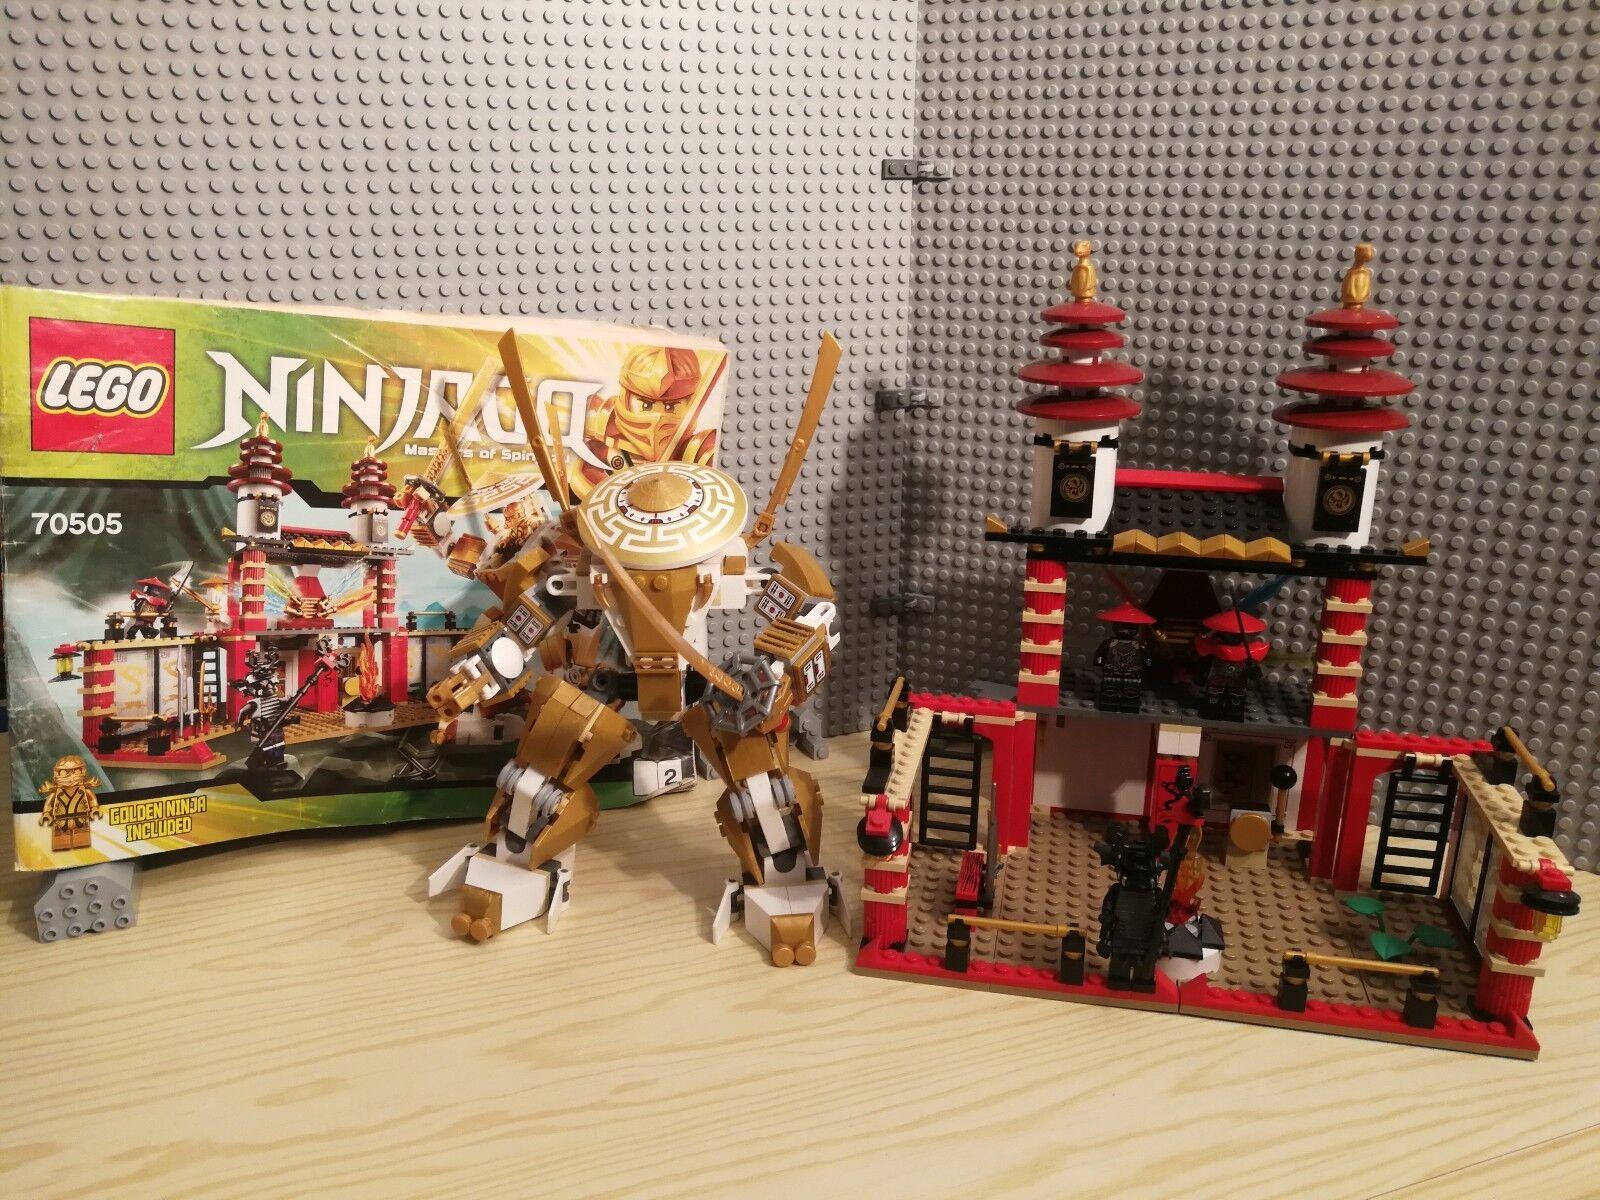 LEGO NINJAGO TEMPIO DELLA LUCE  70505